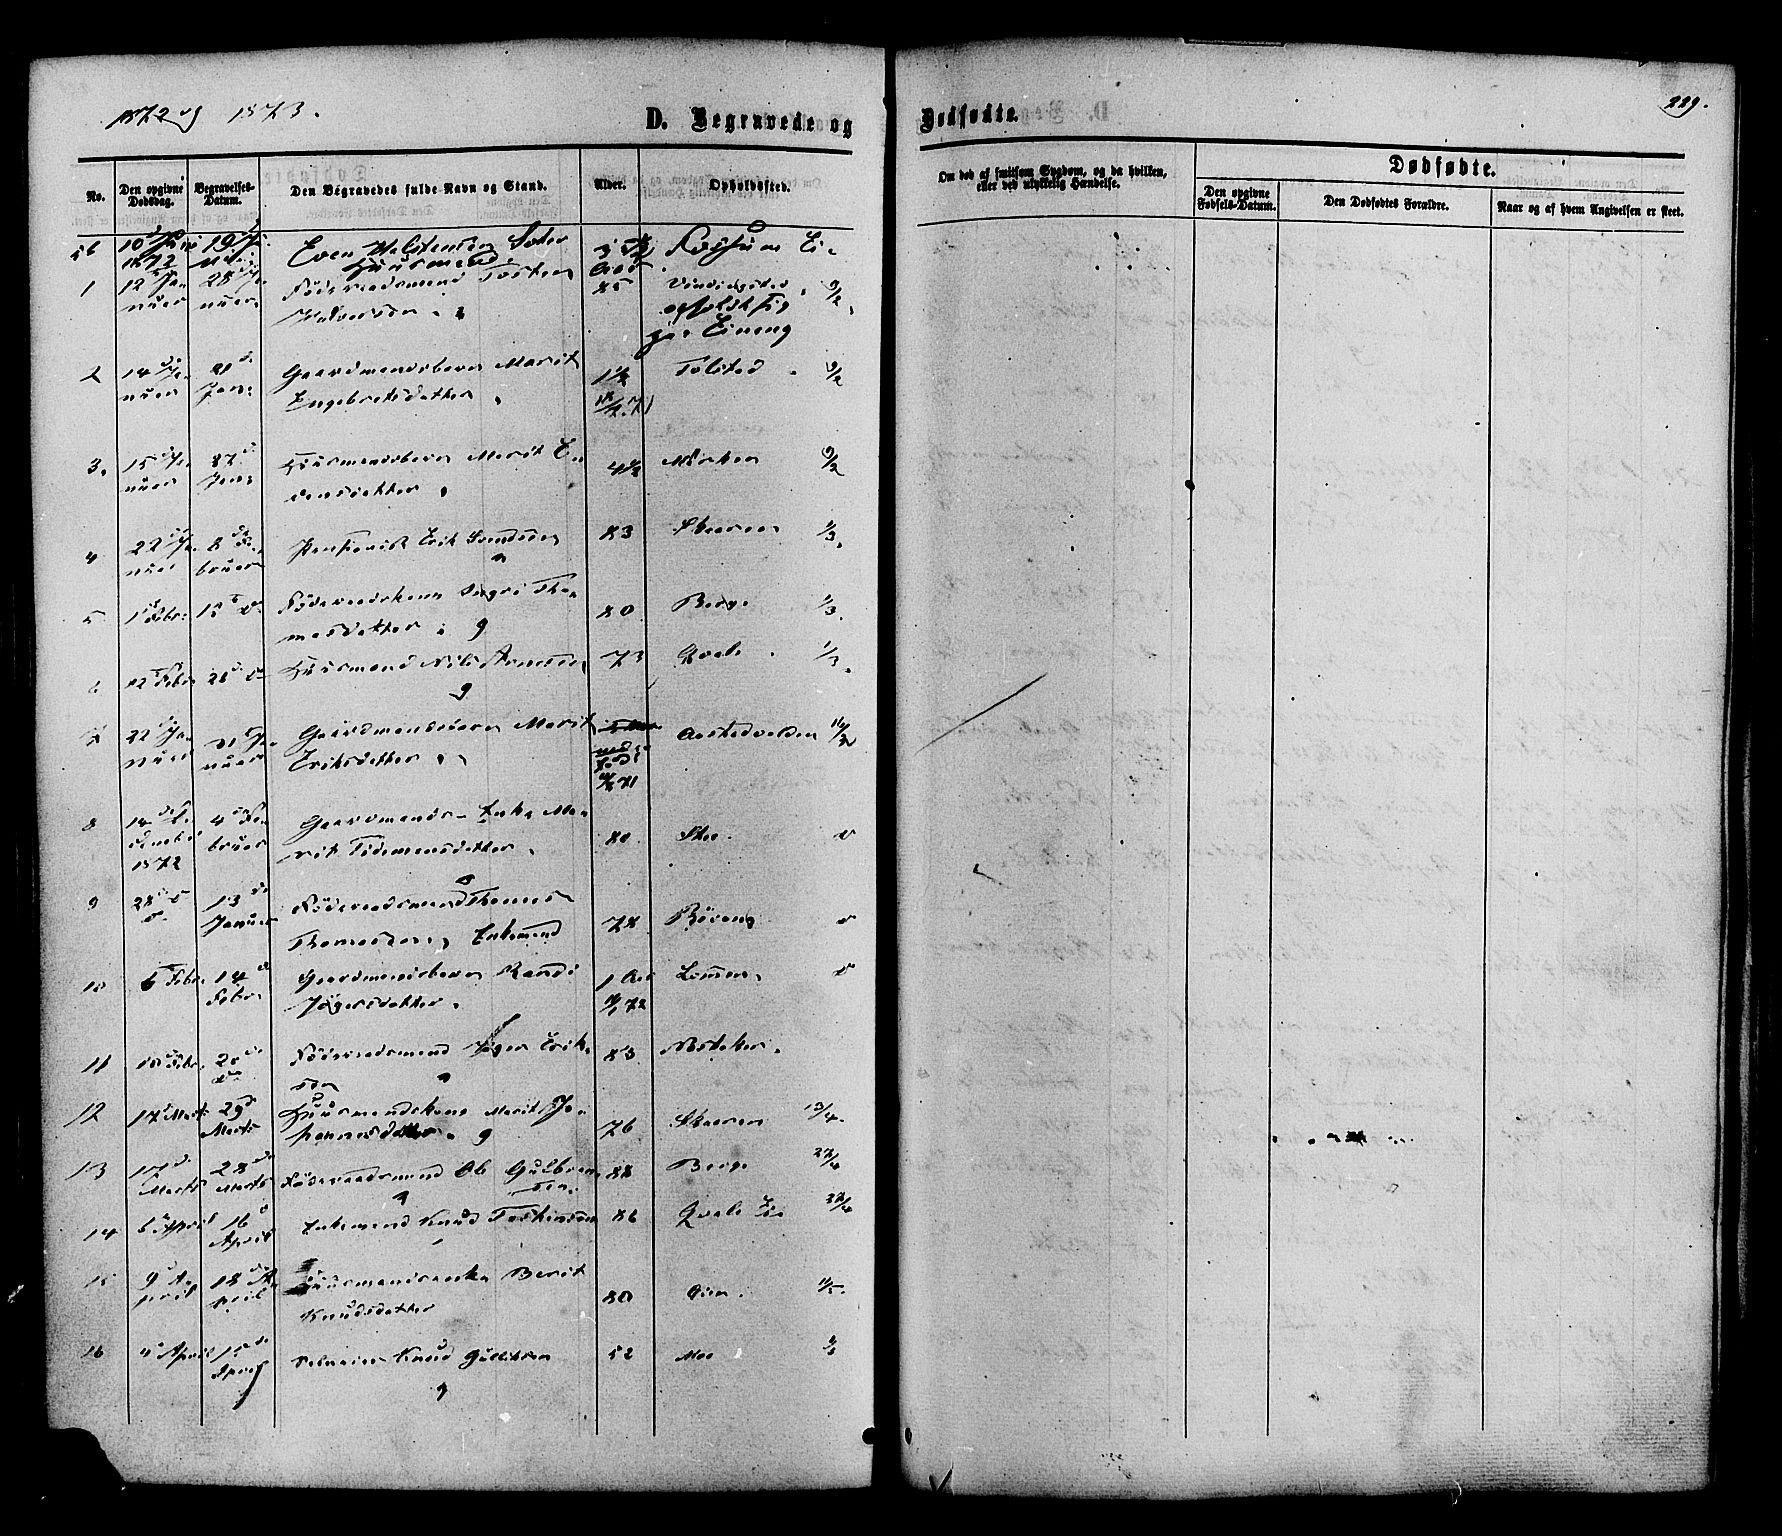 SAH, Vestre Slidre prestekontor, Ministerialbok nr. 3, 1865-1880, s. 229